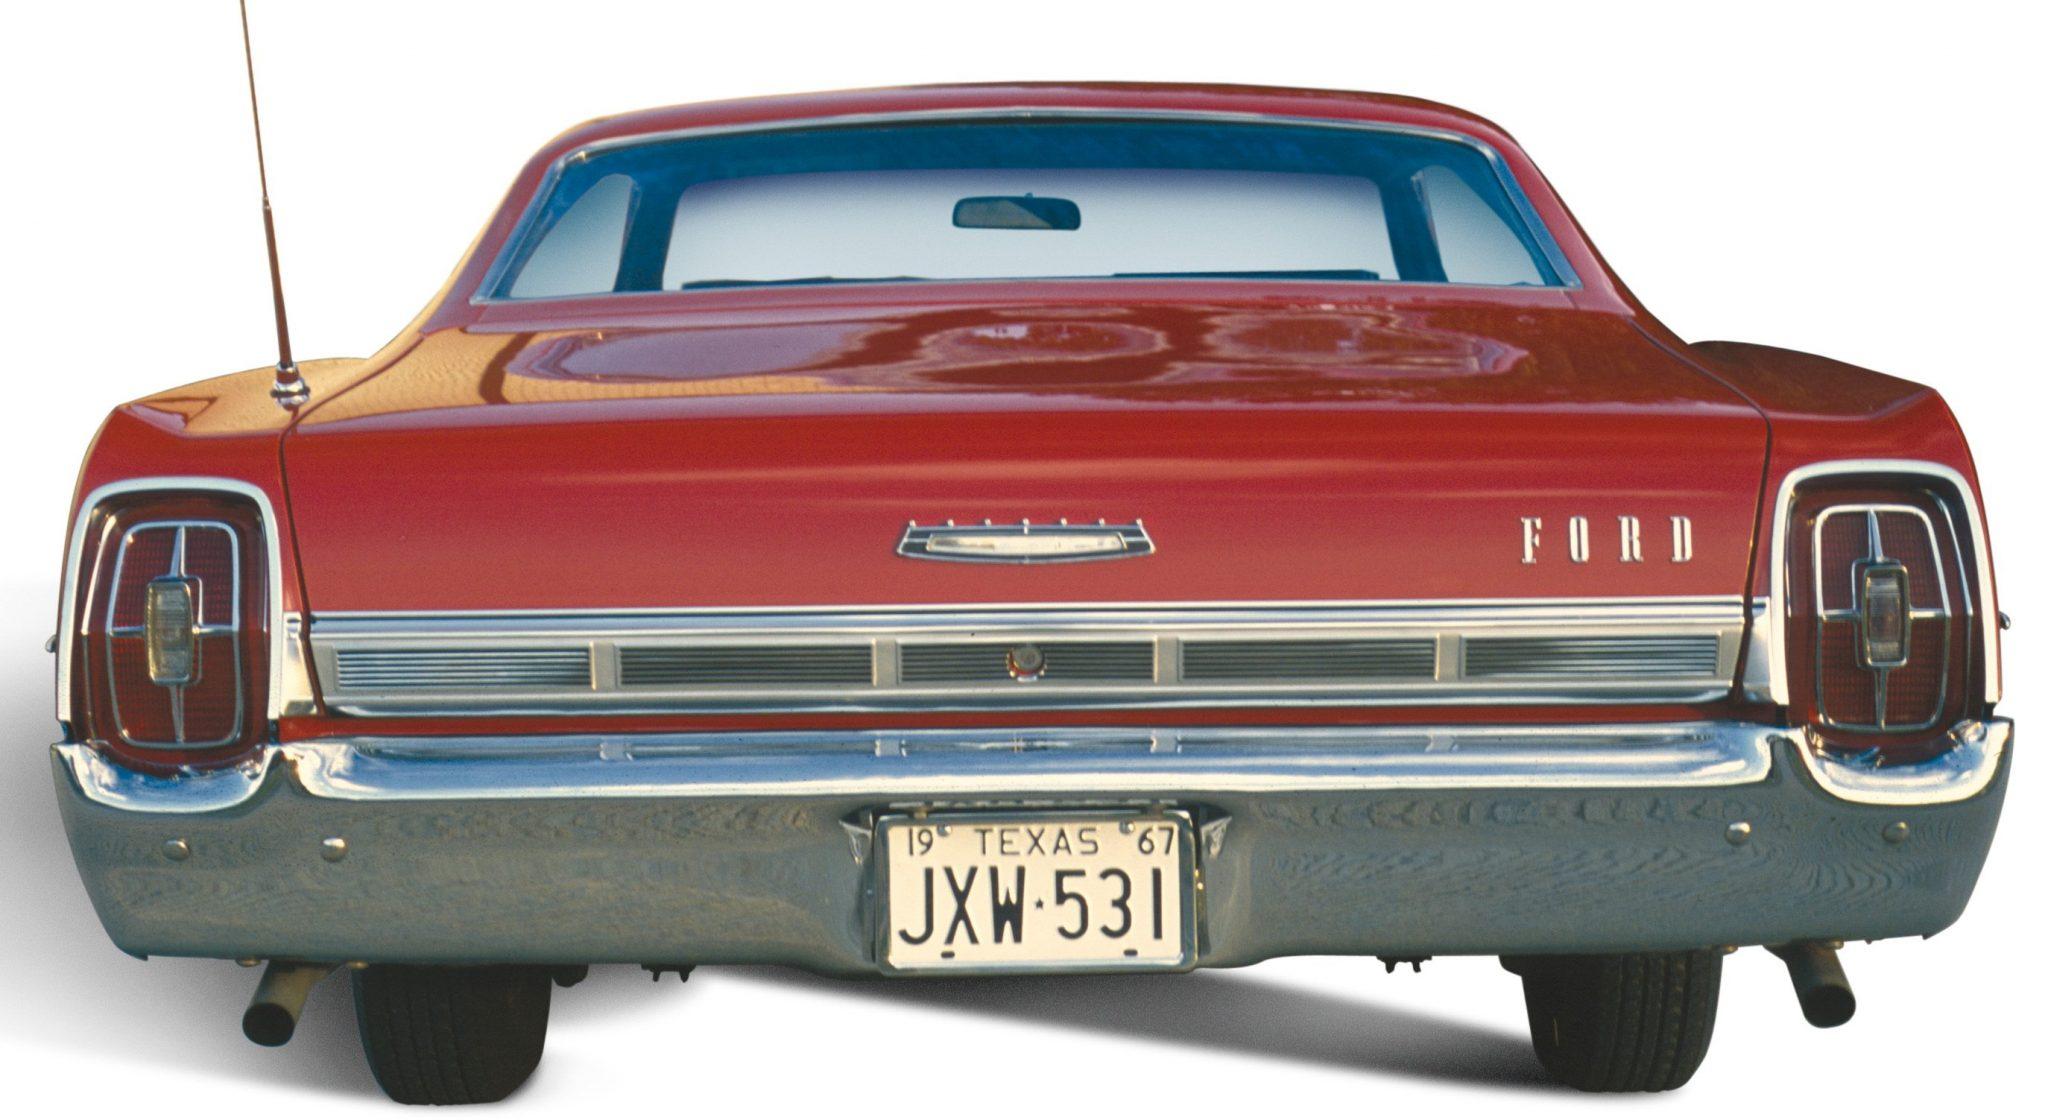 1967 Ford Galaxie 500 backend